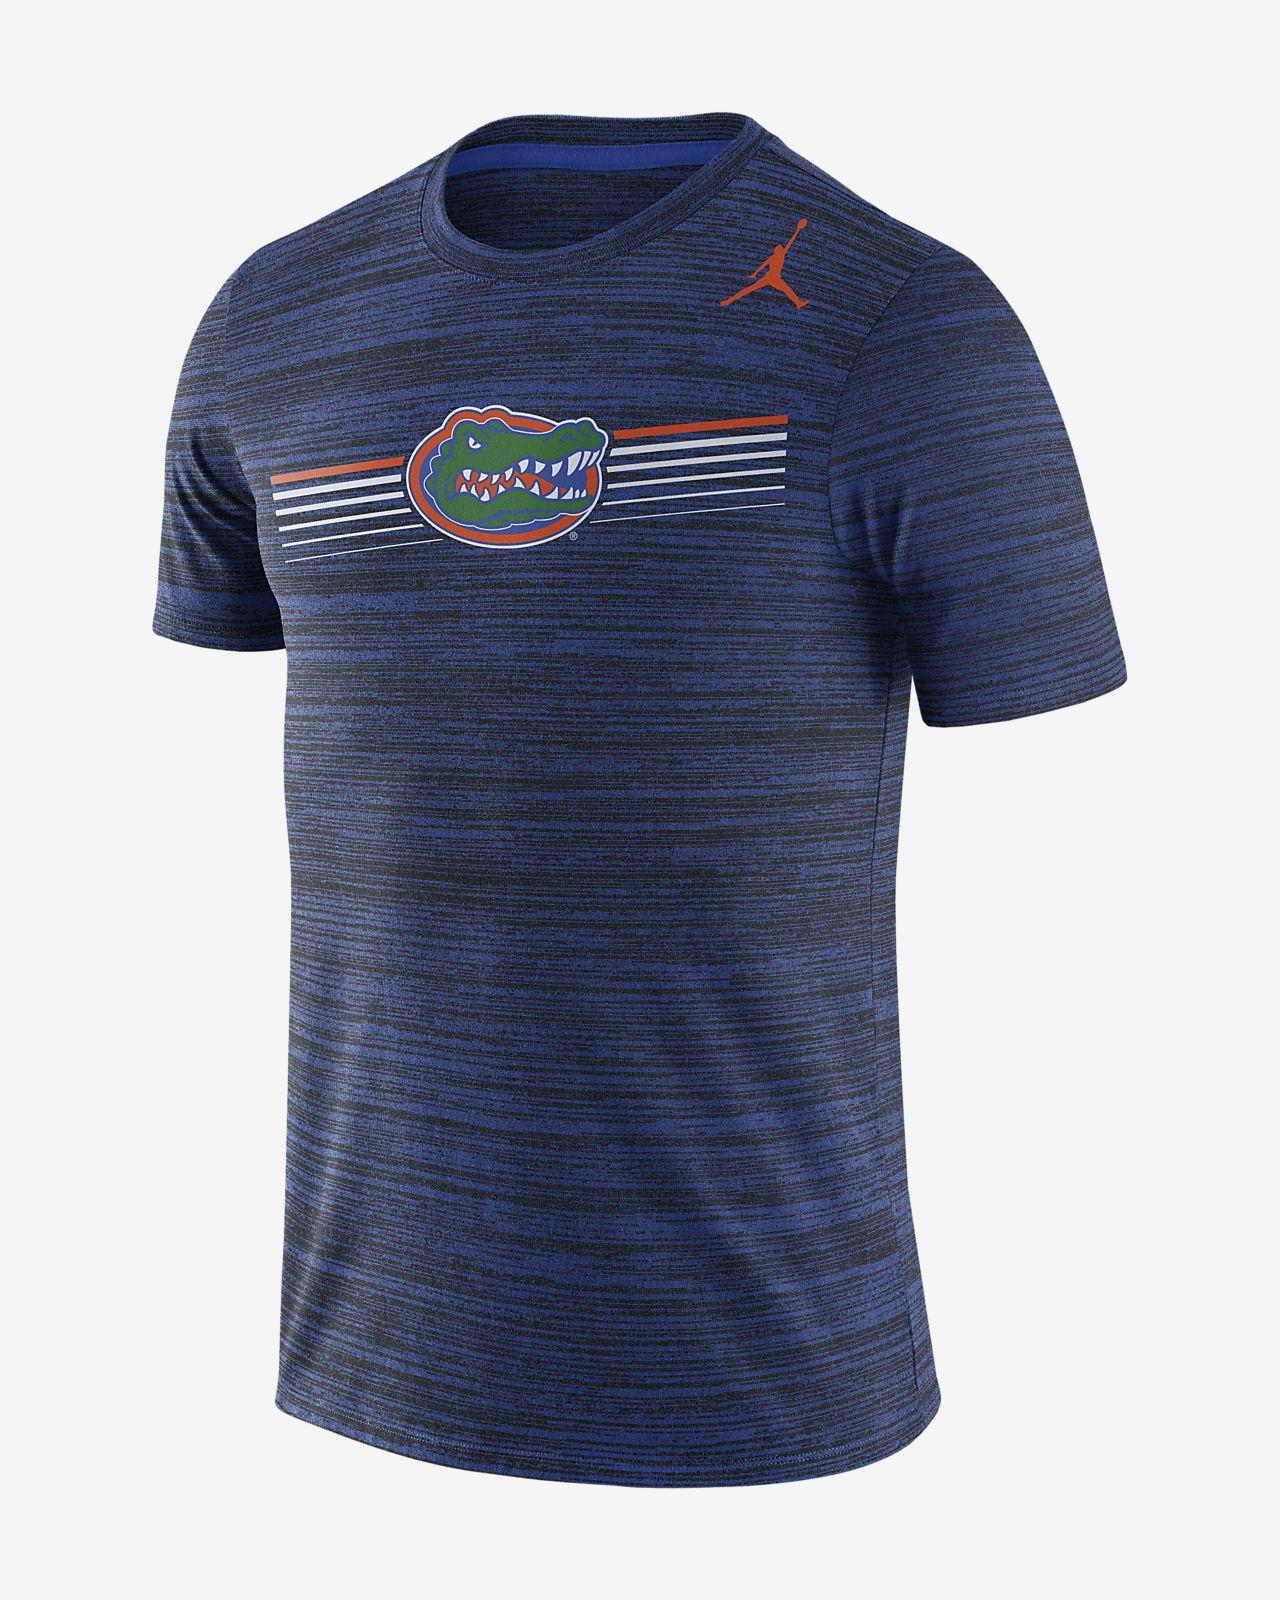 Jordan College Dri-FIT Legend Velocity (Florida) Men's T-Shirt